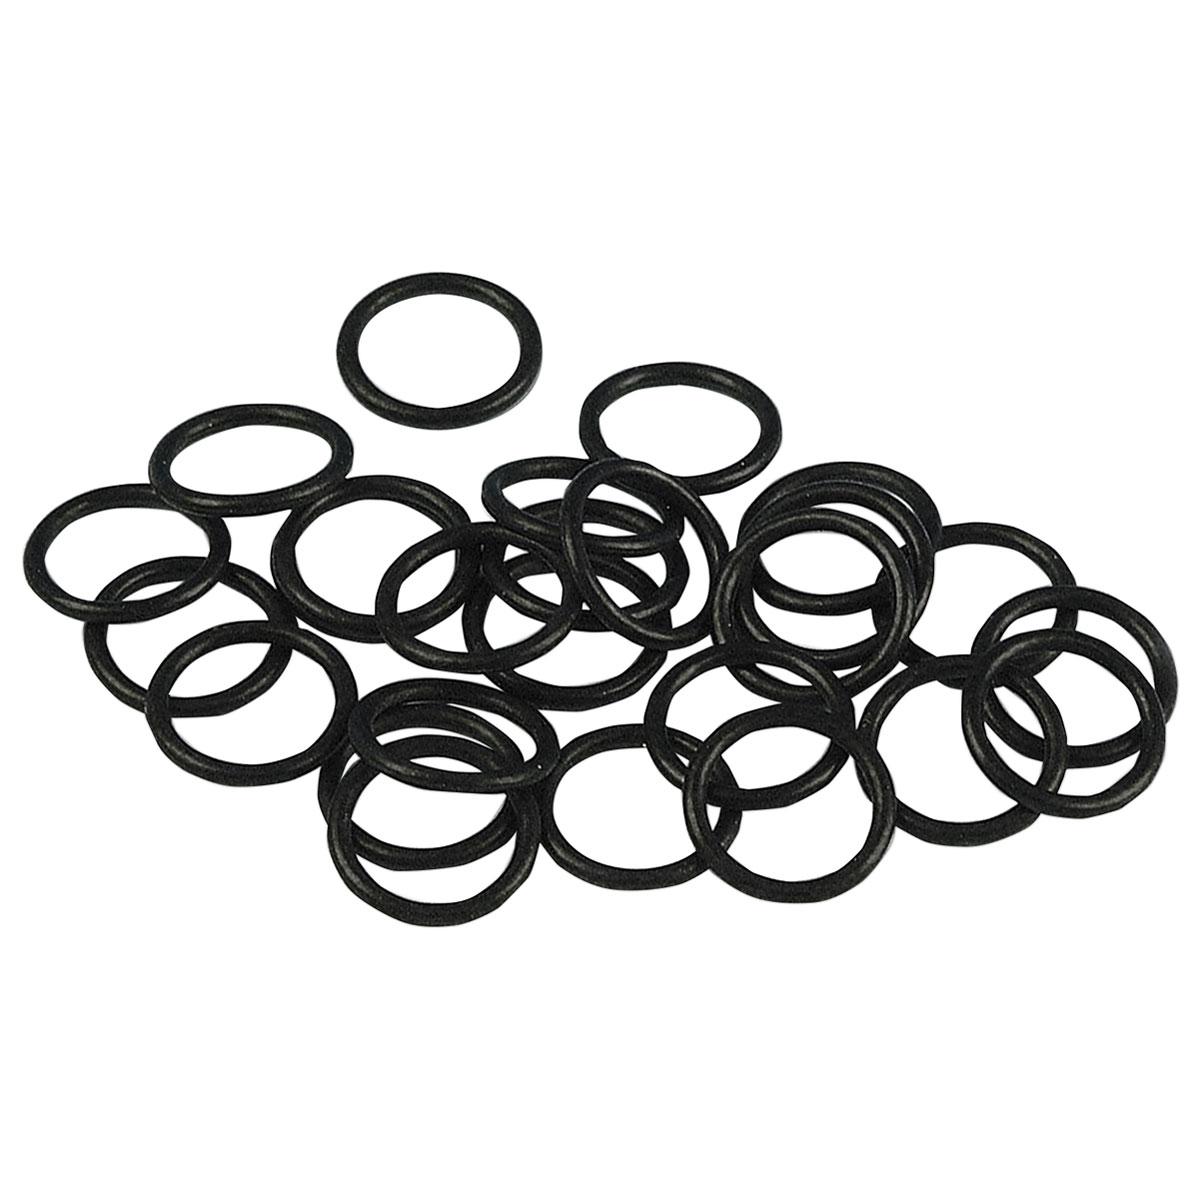 Genuine James Coolant Manifold O-Ring